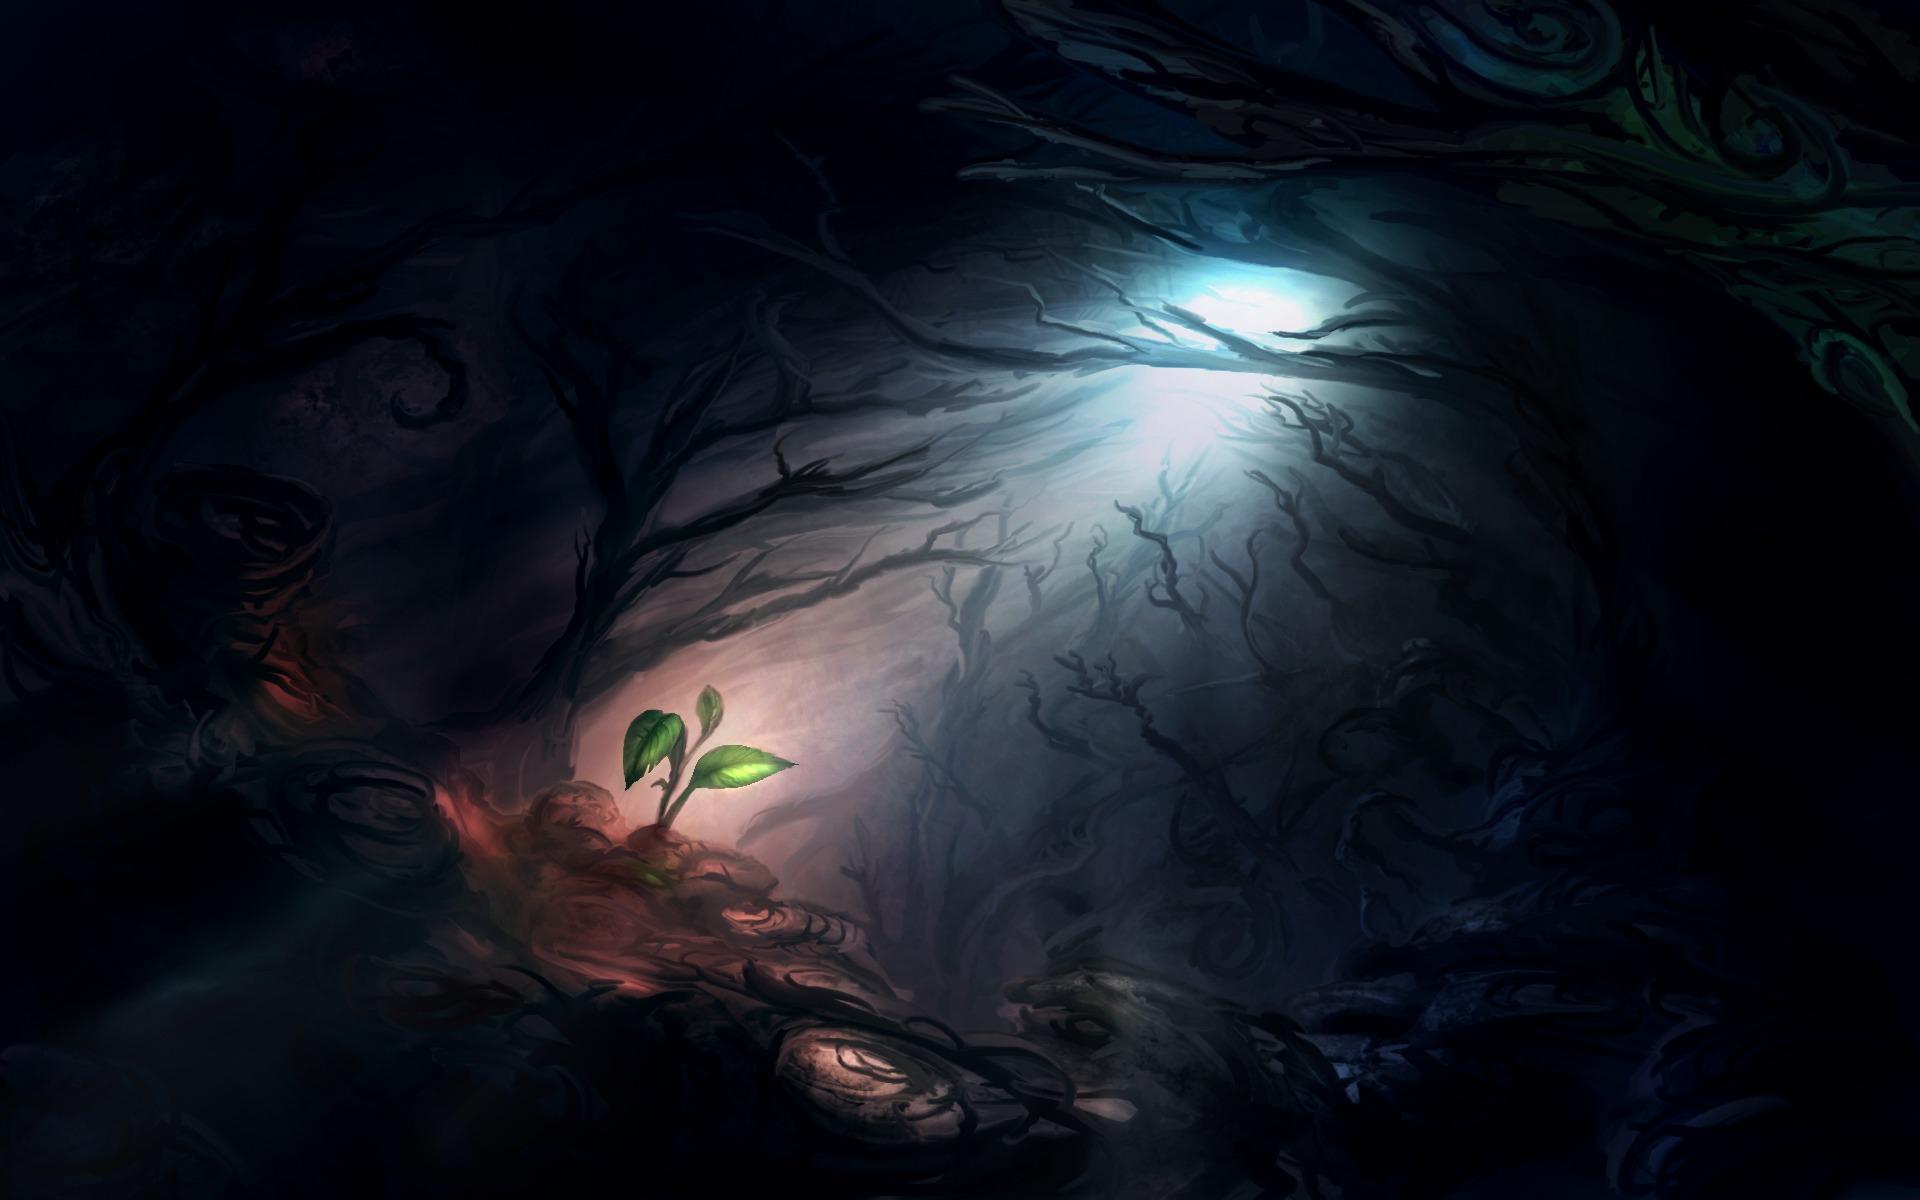 Sombre Fond d'écran HD | Arrière-Plan | 1920x1200 | ID:817987 - Wallpaper Abyss